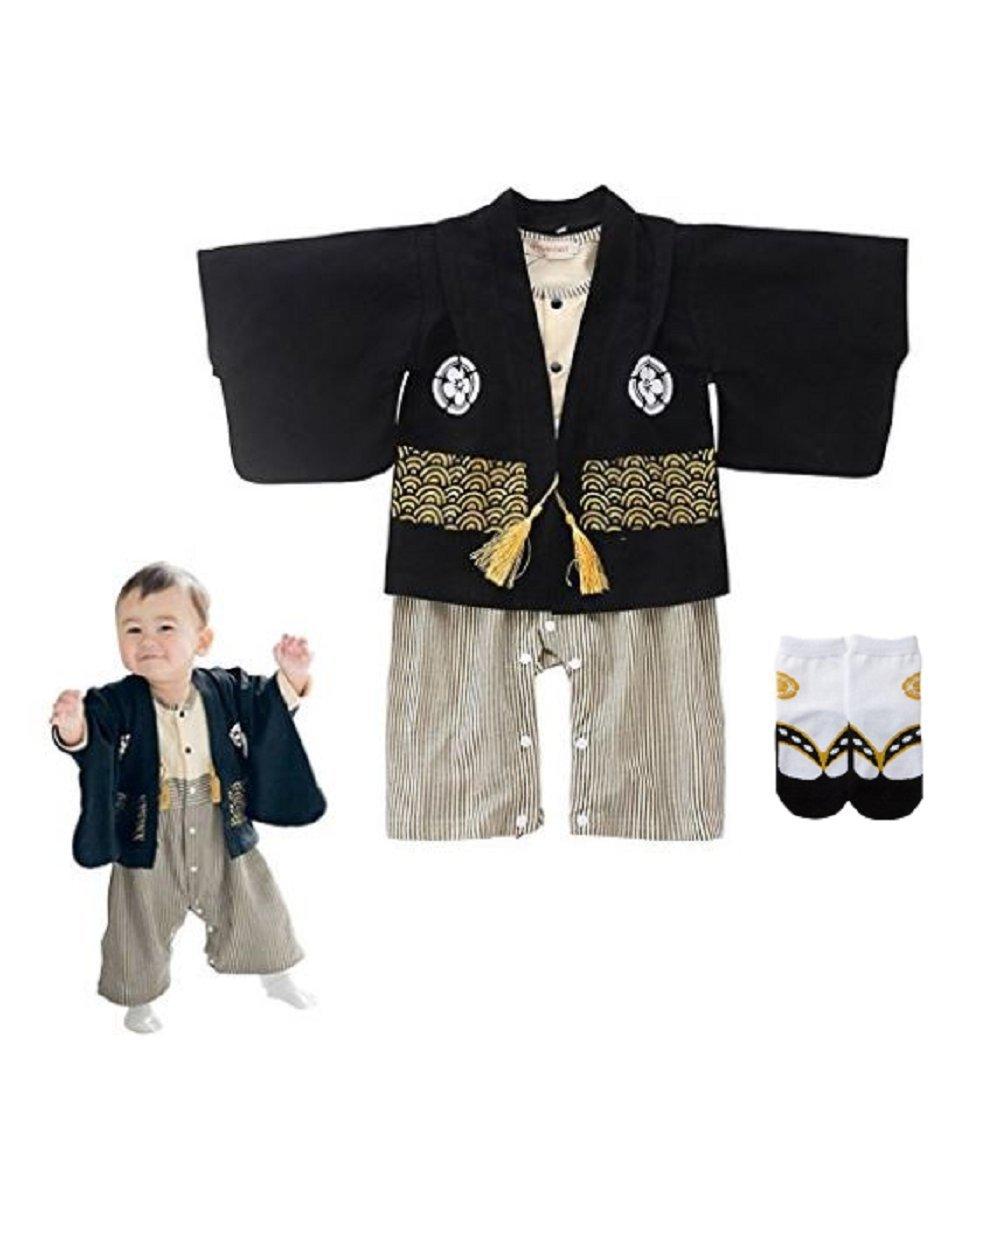 Baby toddler celebration costume for boys (Japanese Kimono) Japanese style socks included,Black Gold,12 Months - 18Months